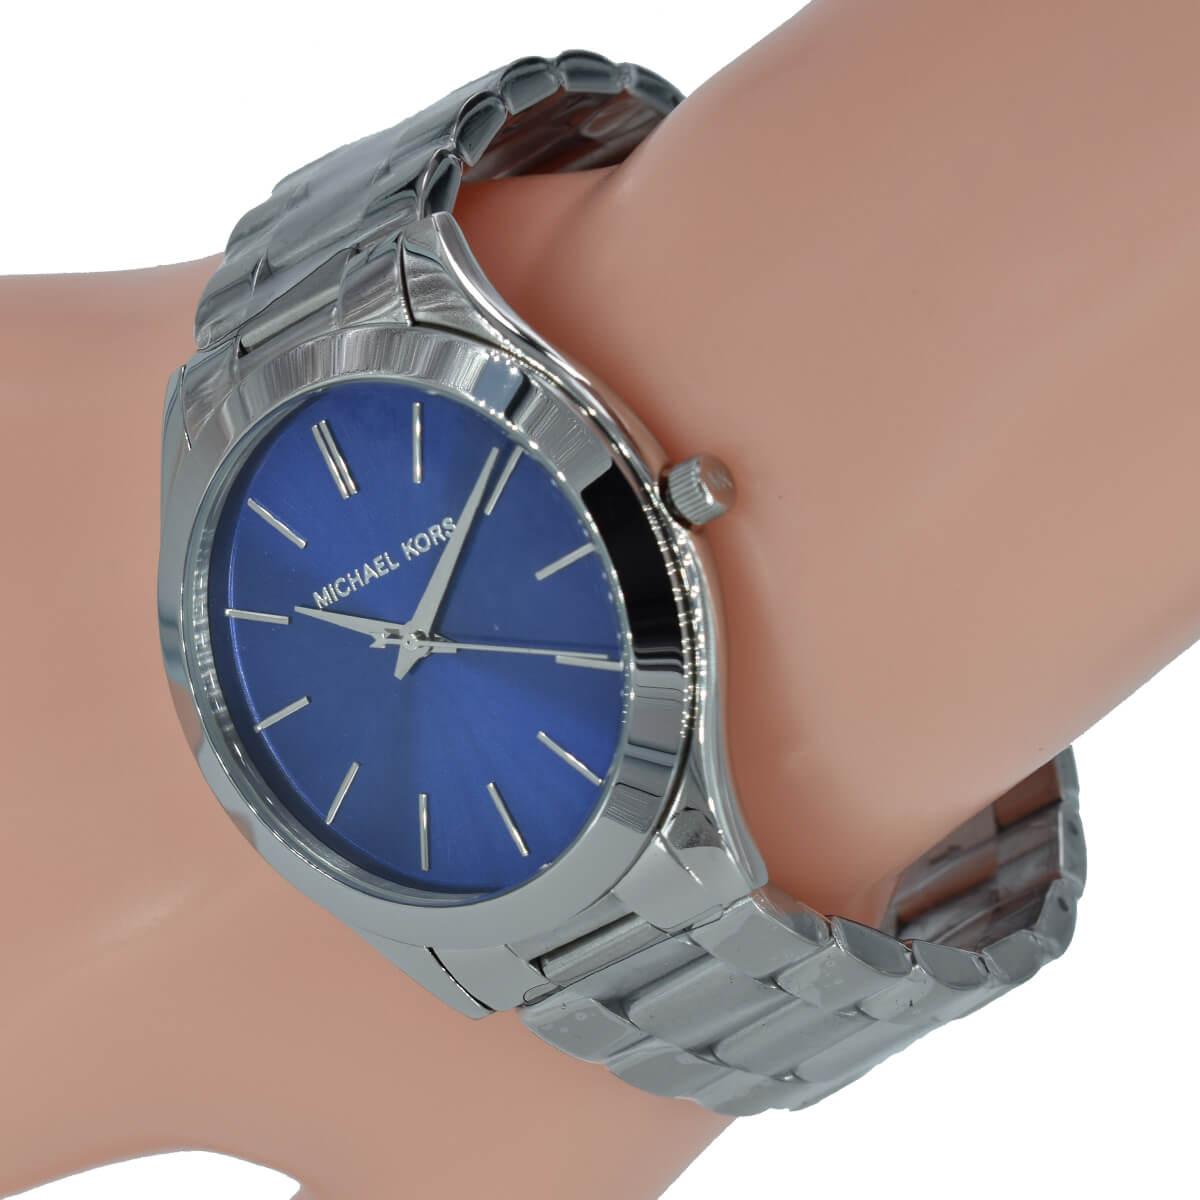 Armband Blau Edelstahl Kors Silber Michael Uhr Runway Damen Mk3379 Slim POXukZi